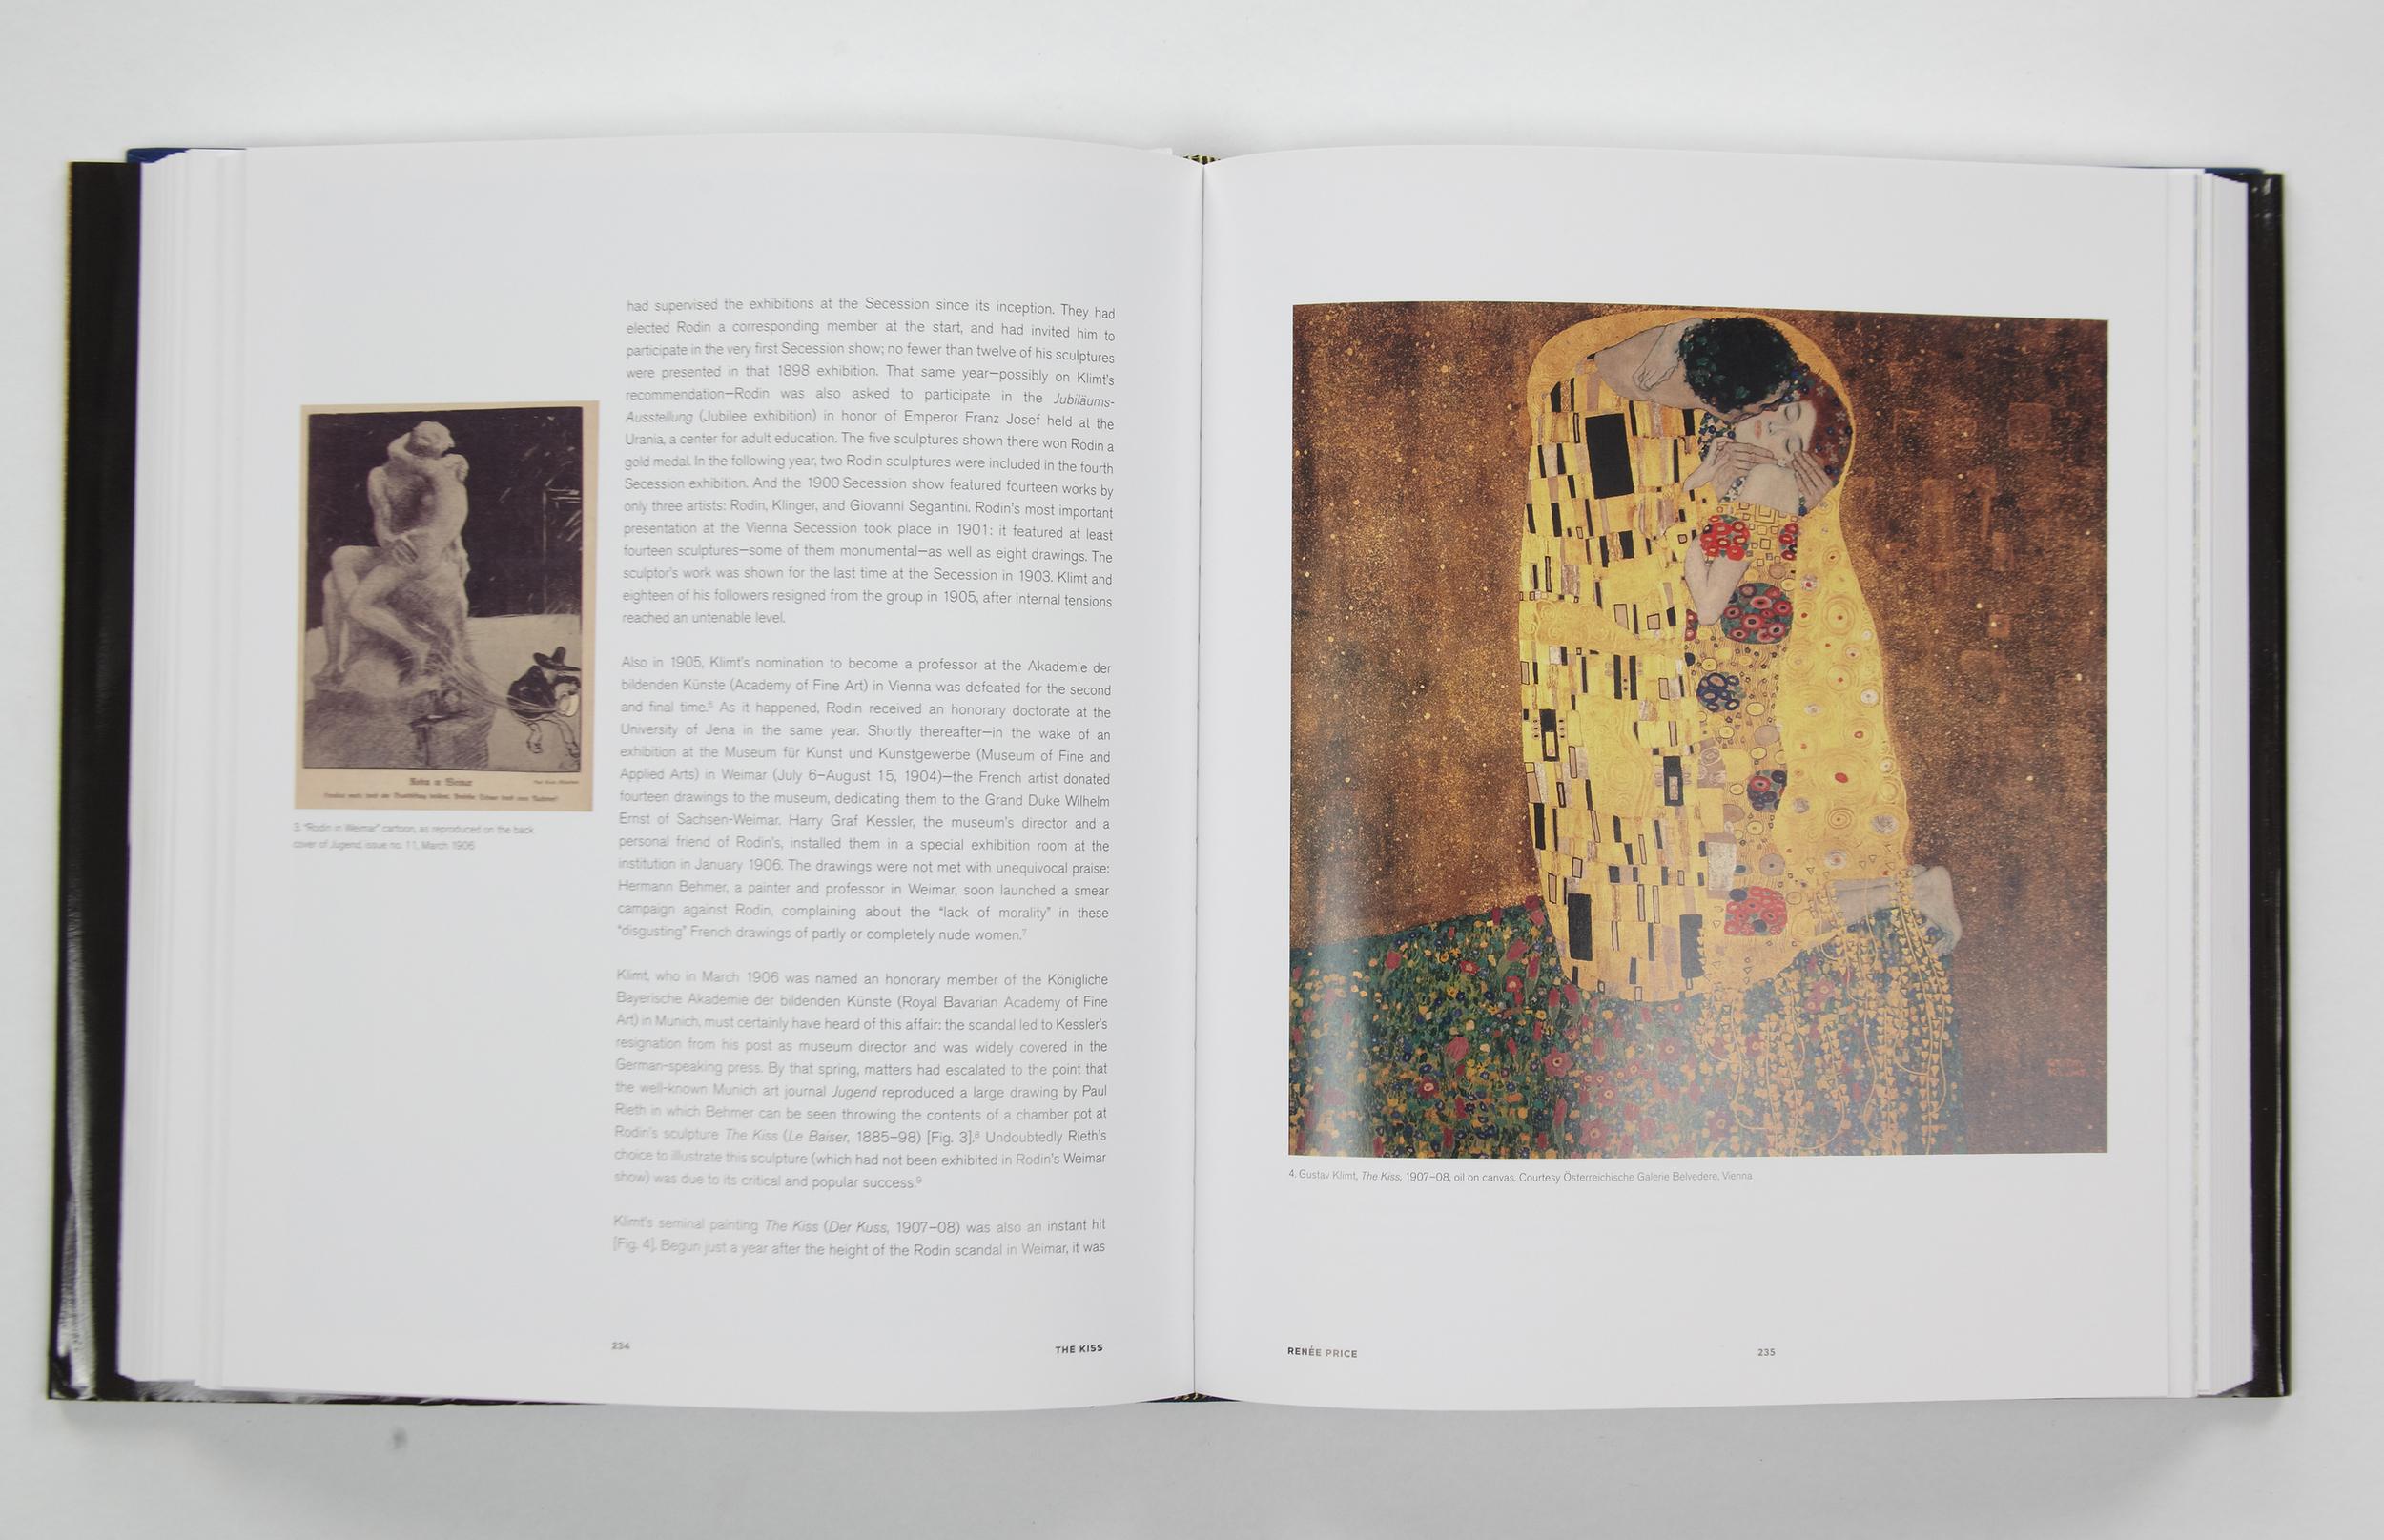 MG_Klimt_bookpost__0011_TSE_Invitations__589.jpg.jpg